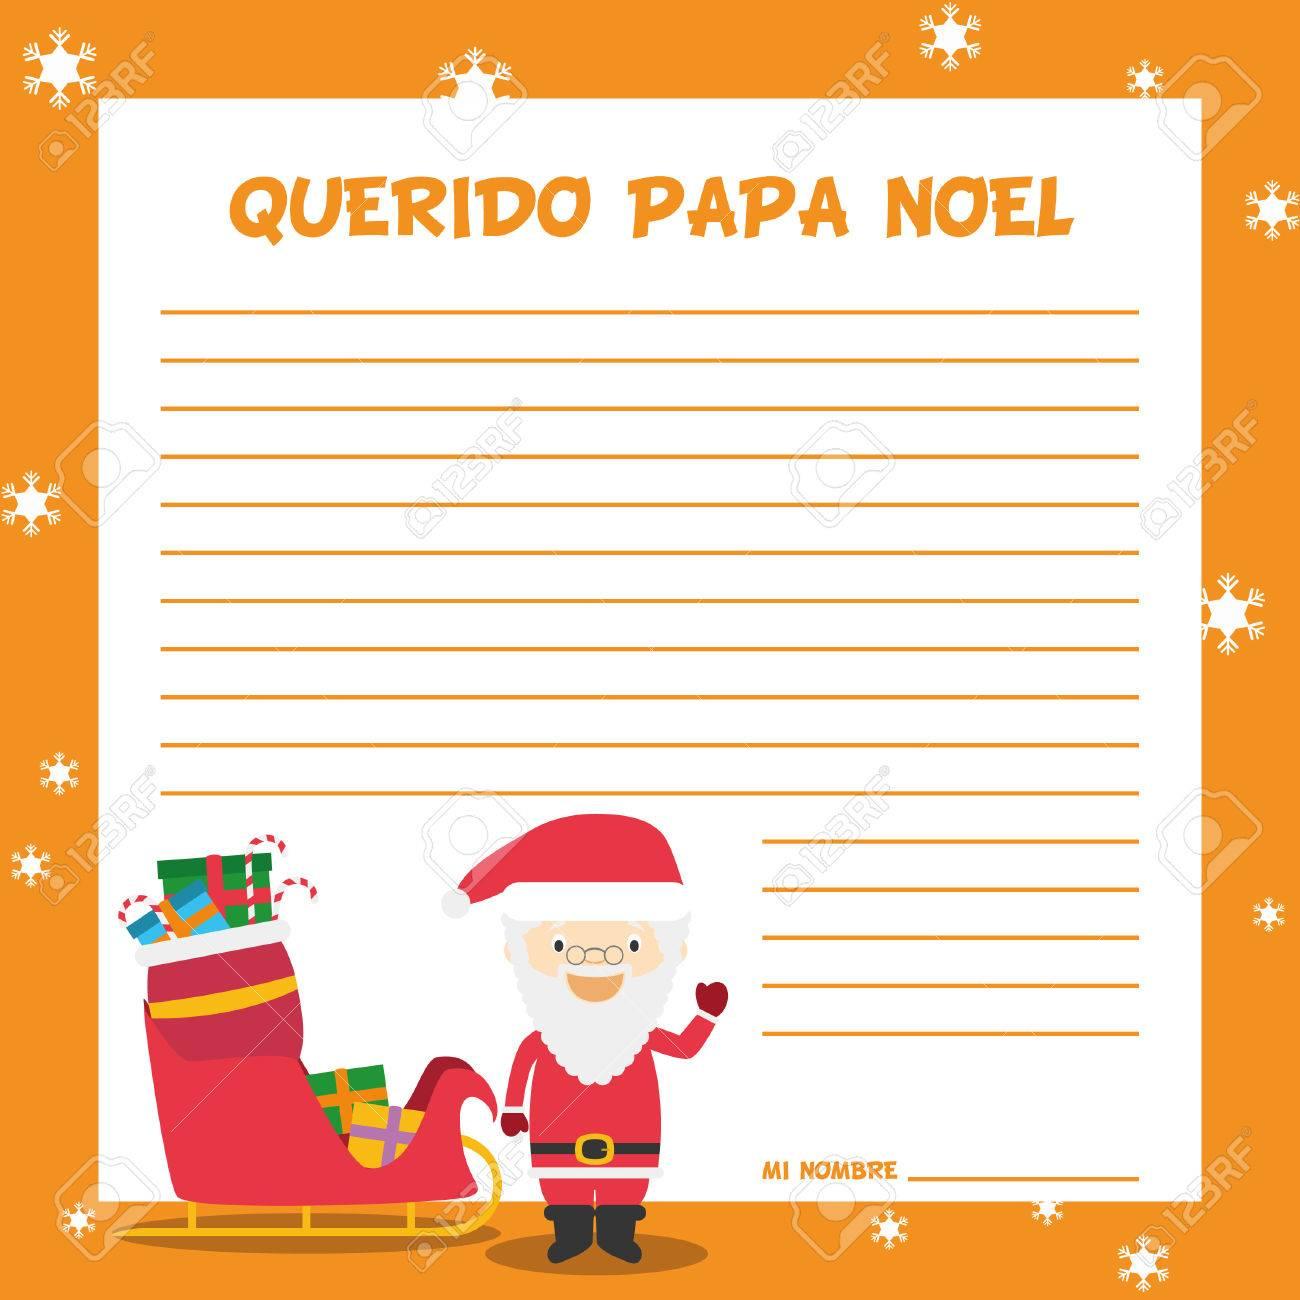 Uncategorized Santa Claus In Spanish santa claus letter template vector illustration for christmas time in spanish stock 49610638